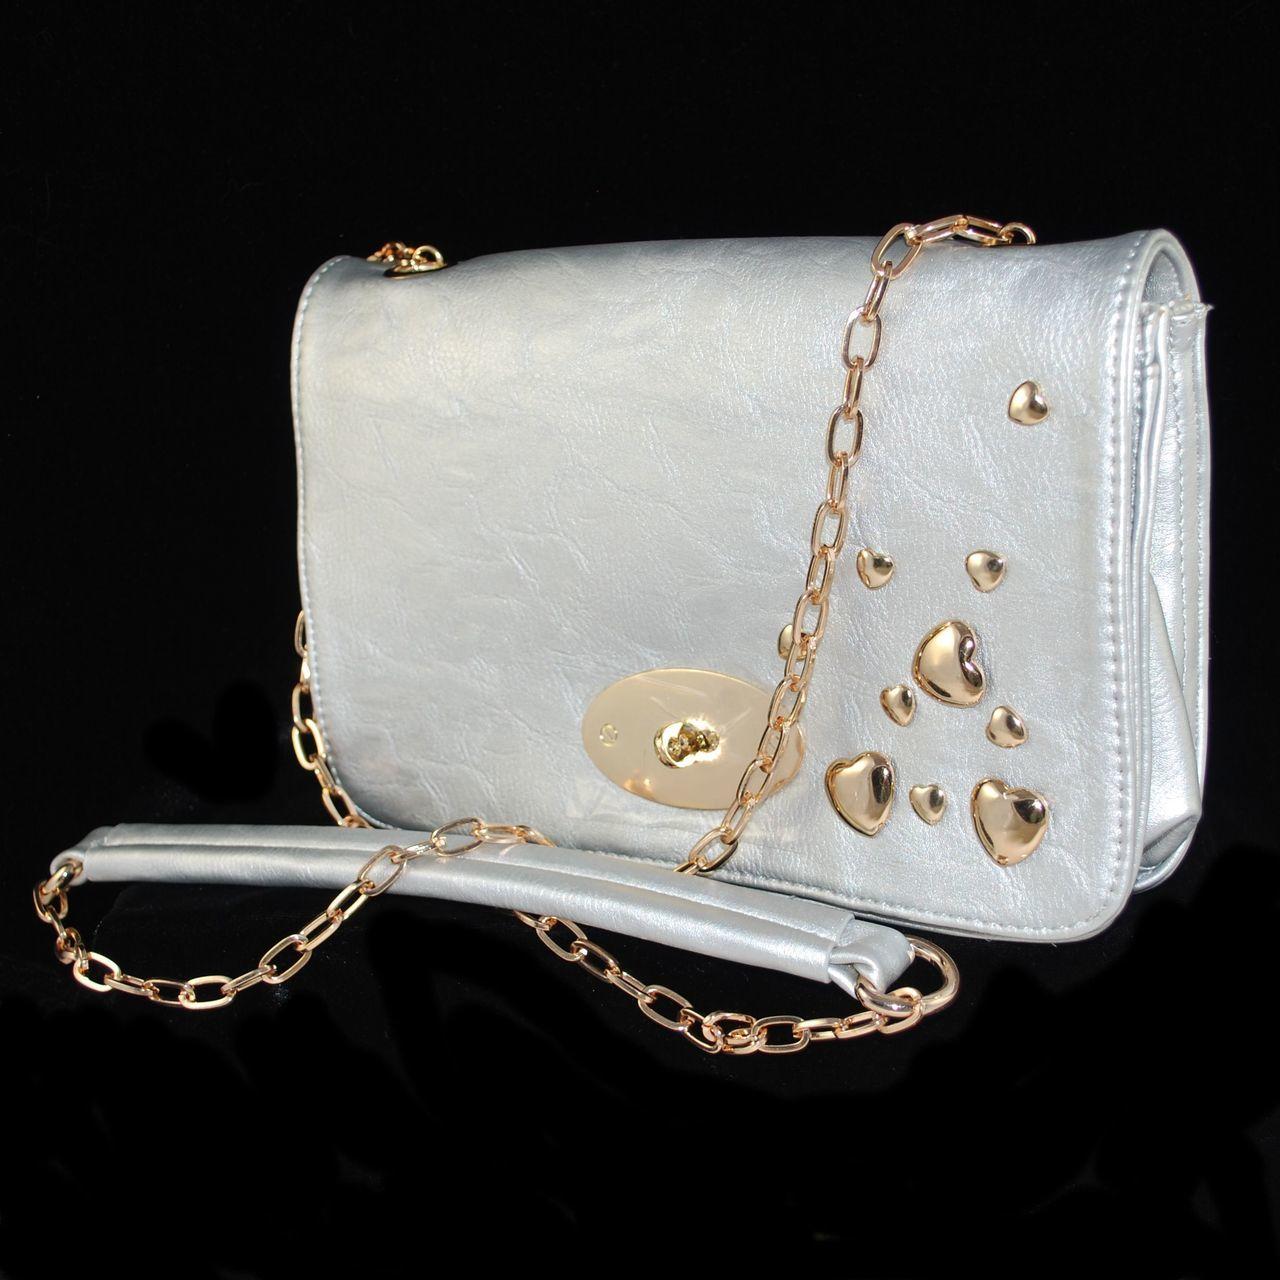 Enchanting Jewelry Creations image 23